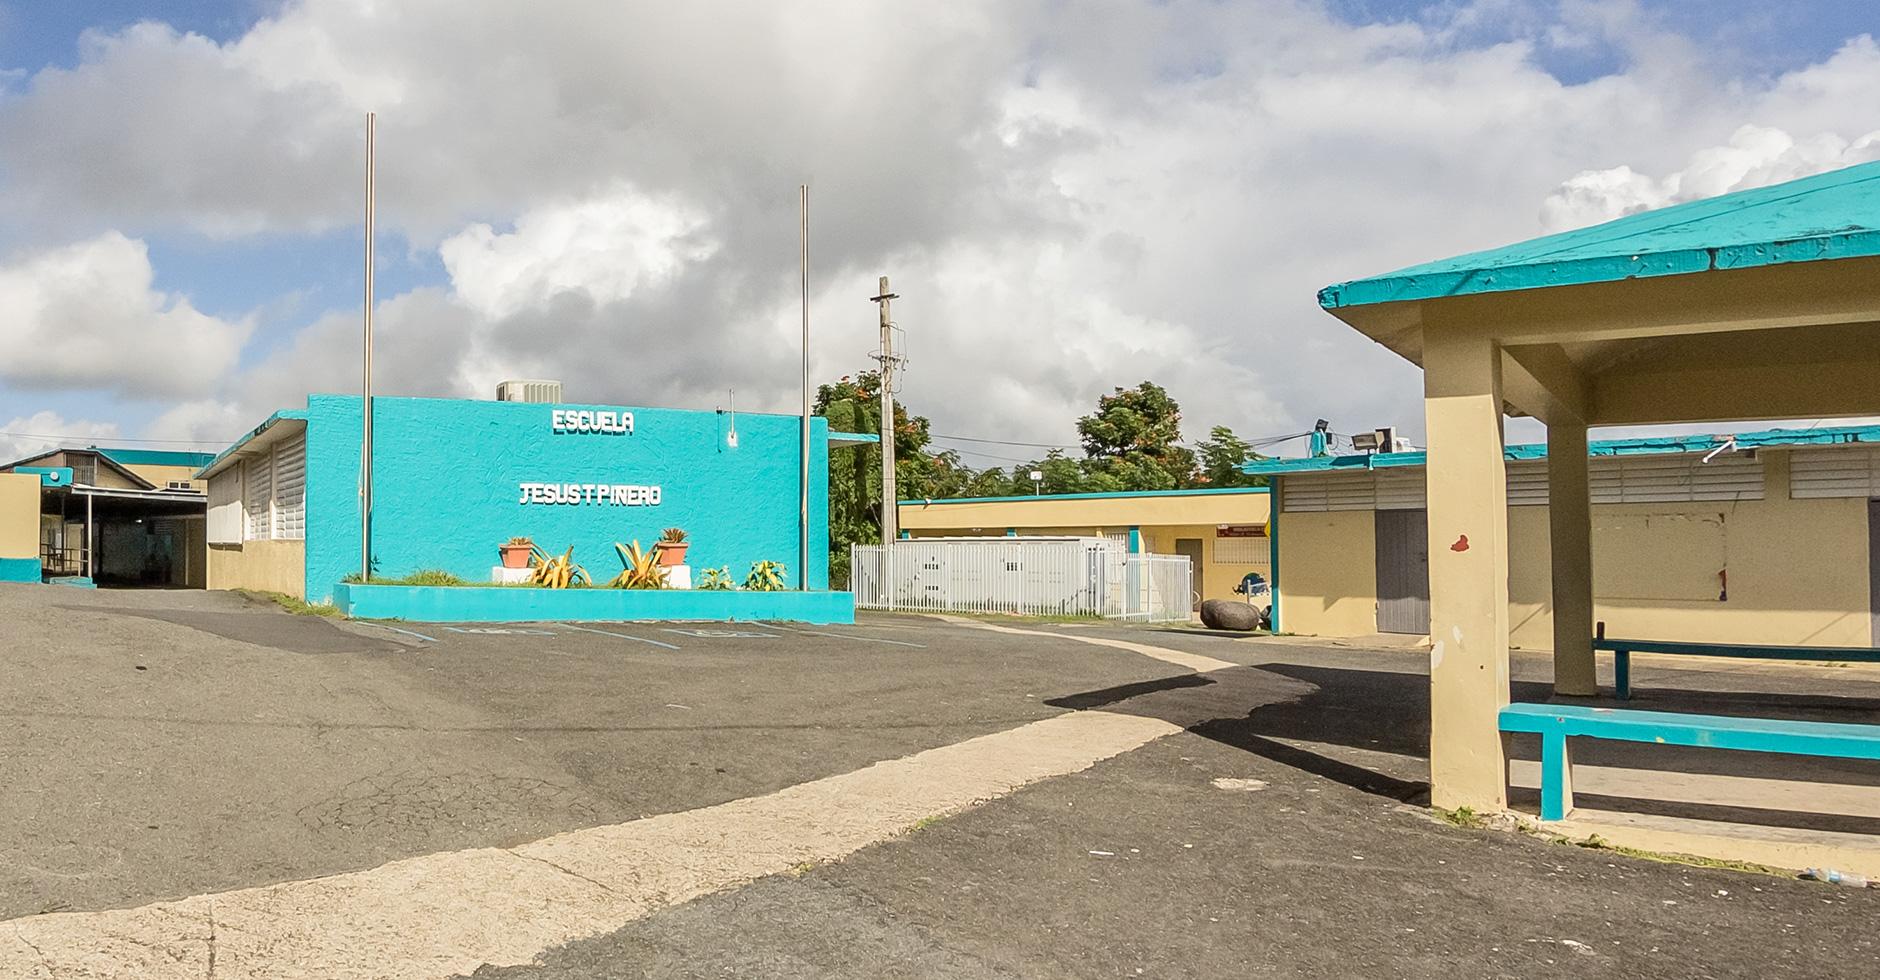 Escuela Jesús T. Piñero